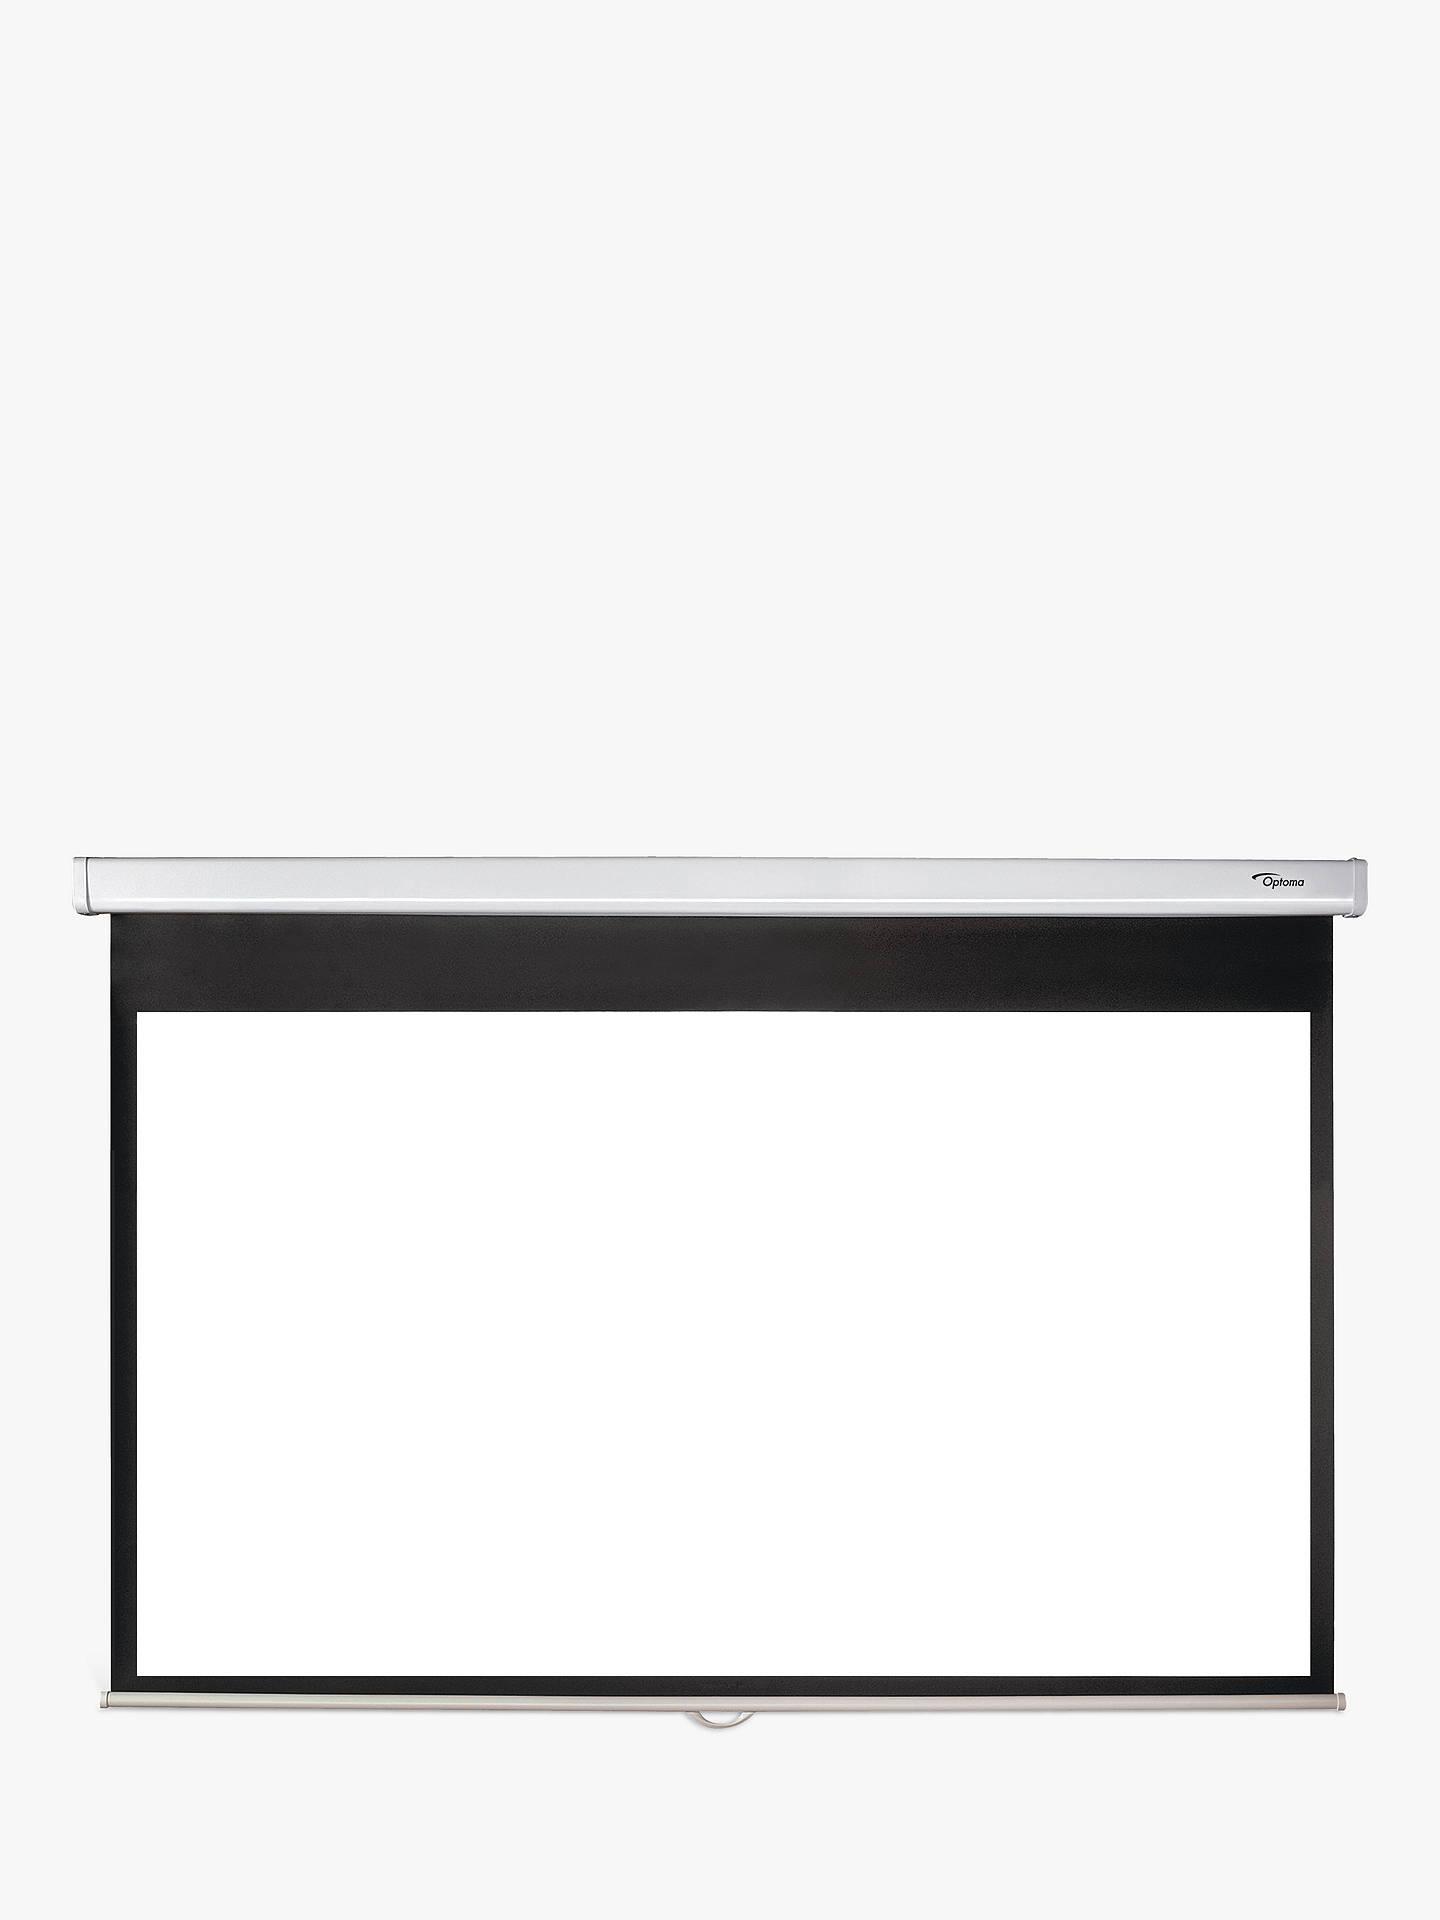 BuyOptoma DS 9092PWC 169 92 Diagonal Pull Down Projector Screen